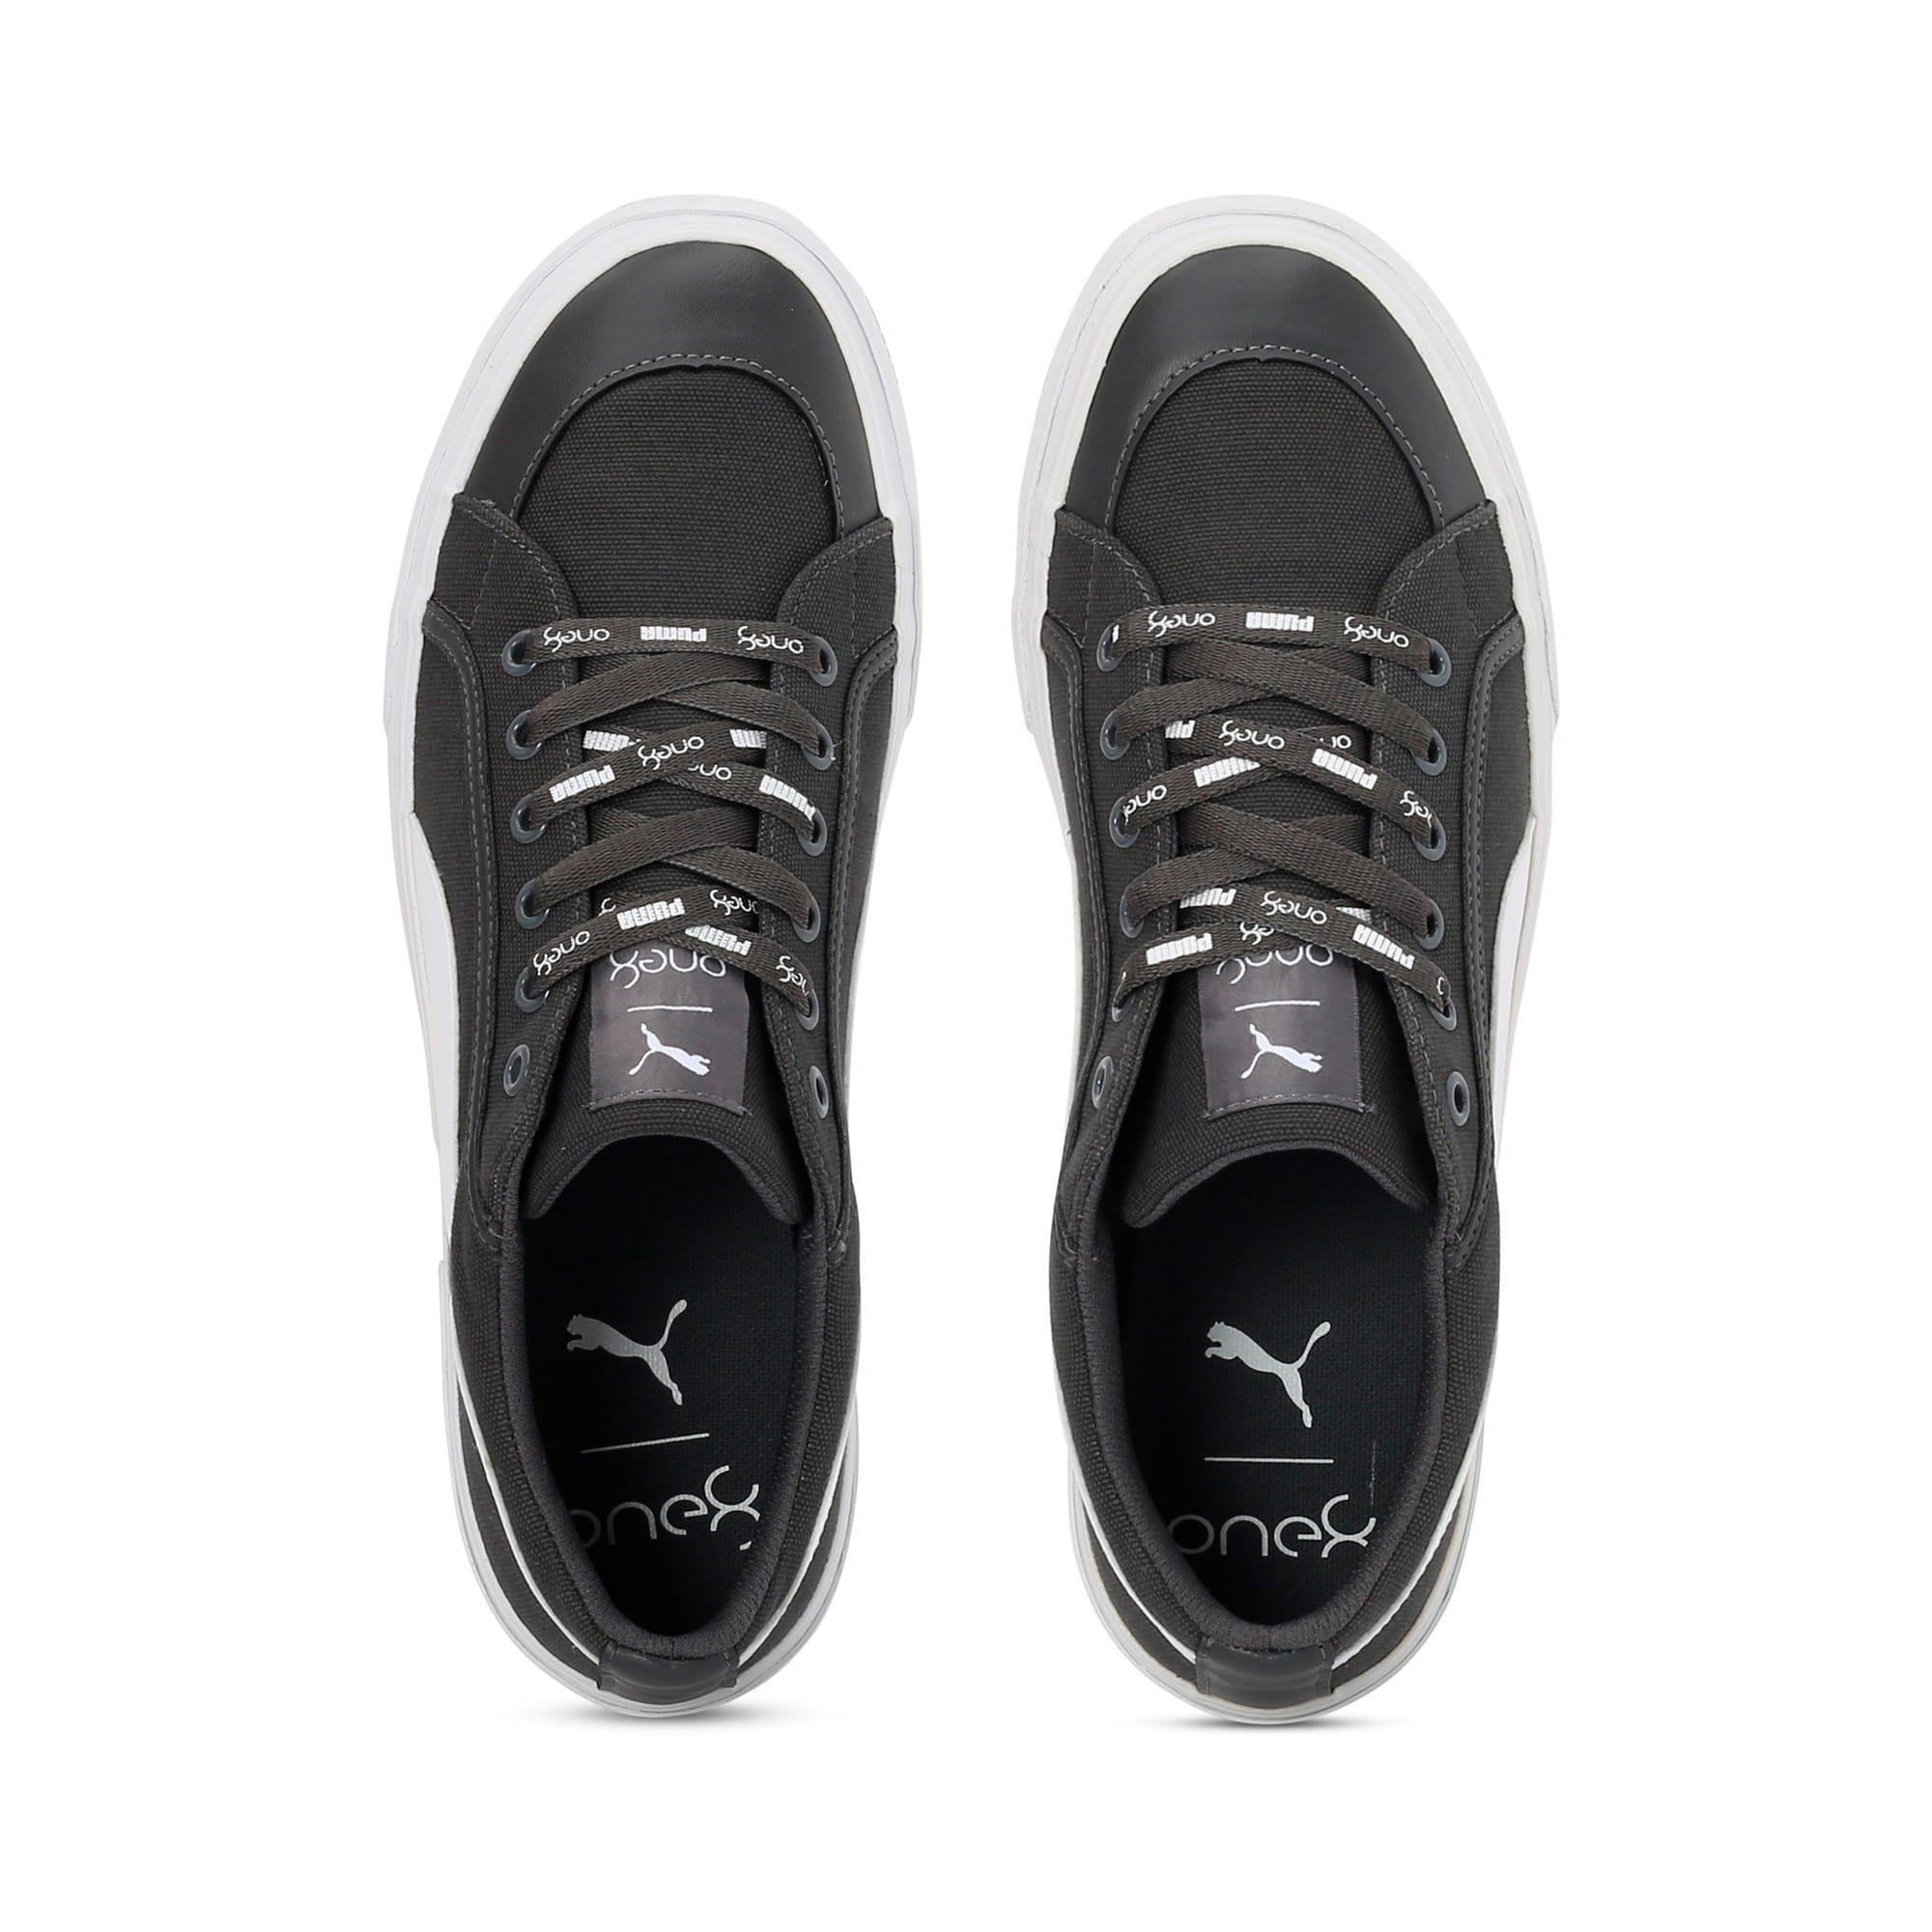 Thumbnail 6 of one8 V2 IDP Men's Sneakers, Iron Gate-Puma White, medium-IND